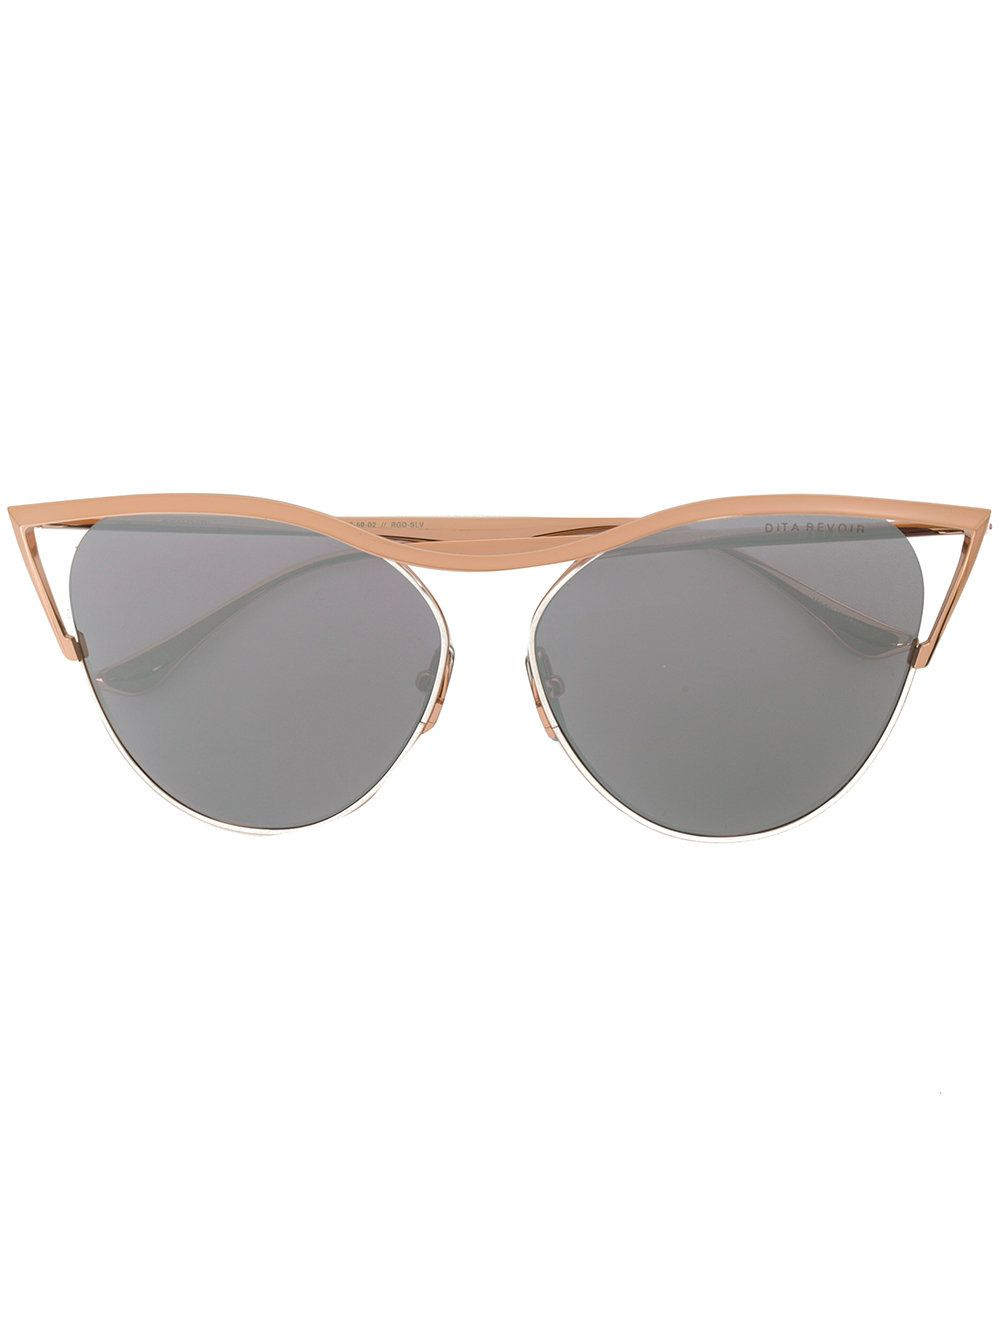 e007ee8af3f DITA Revoir sunglasses